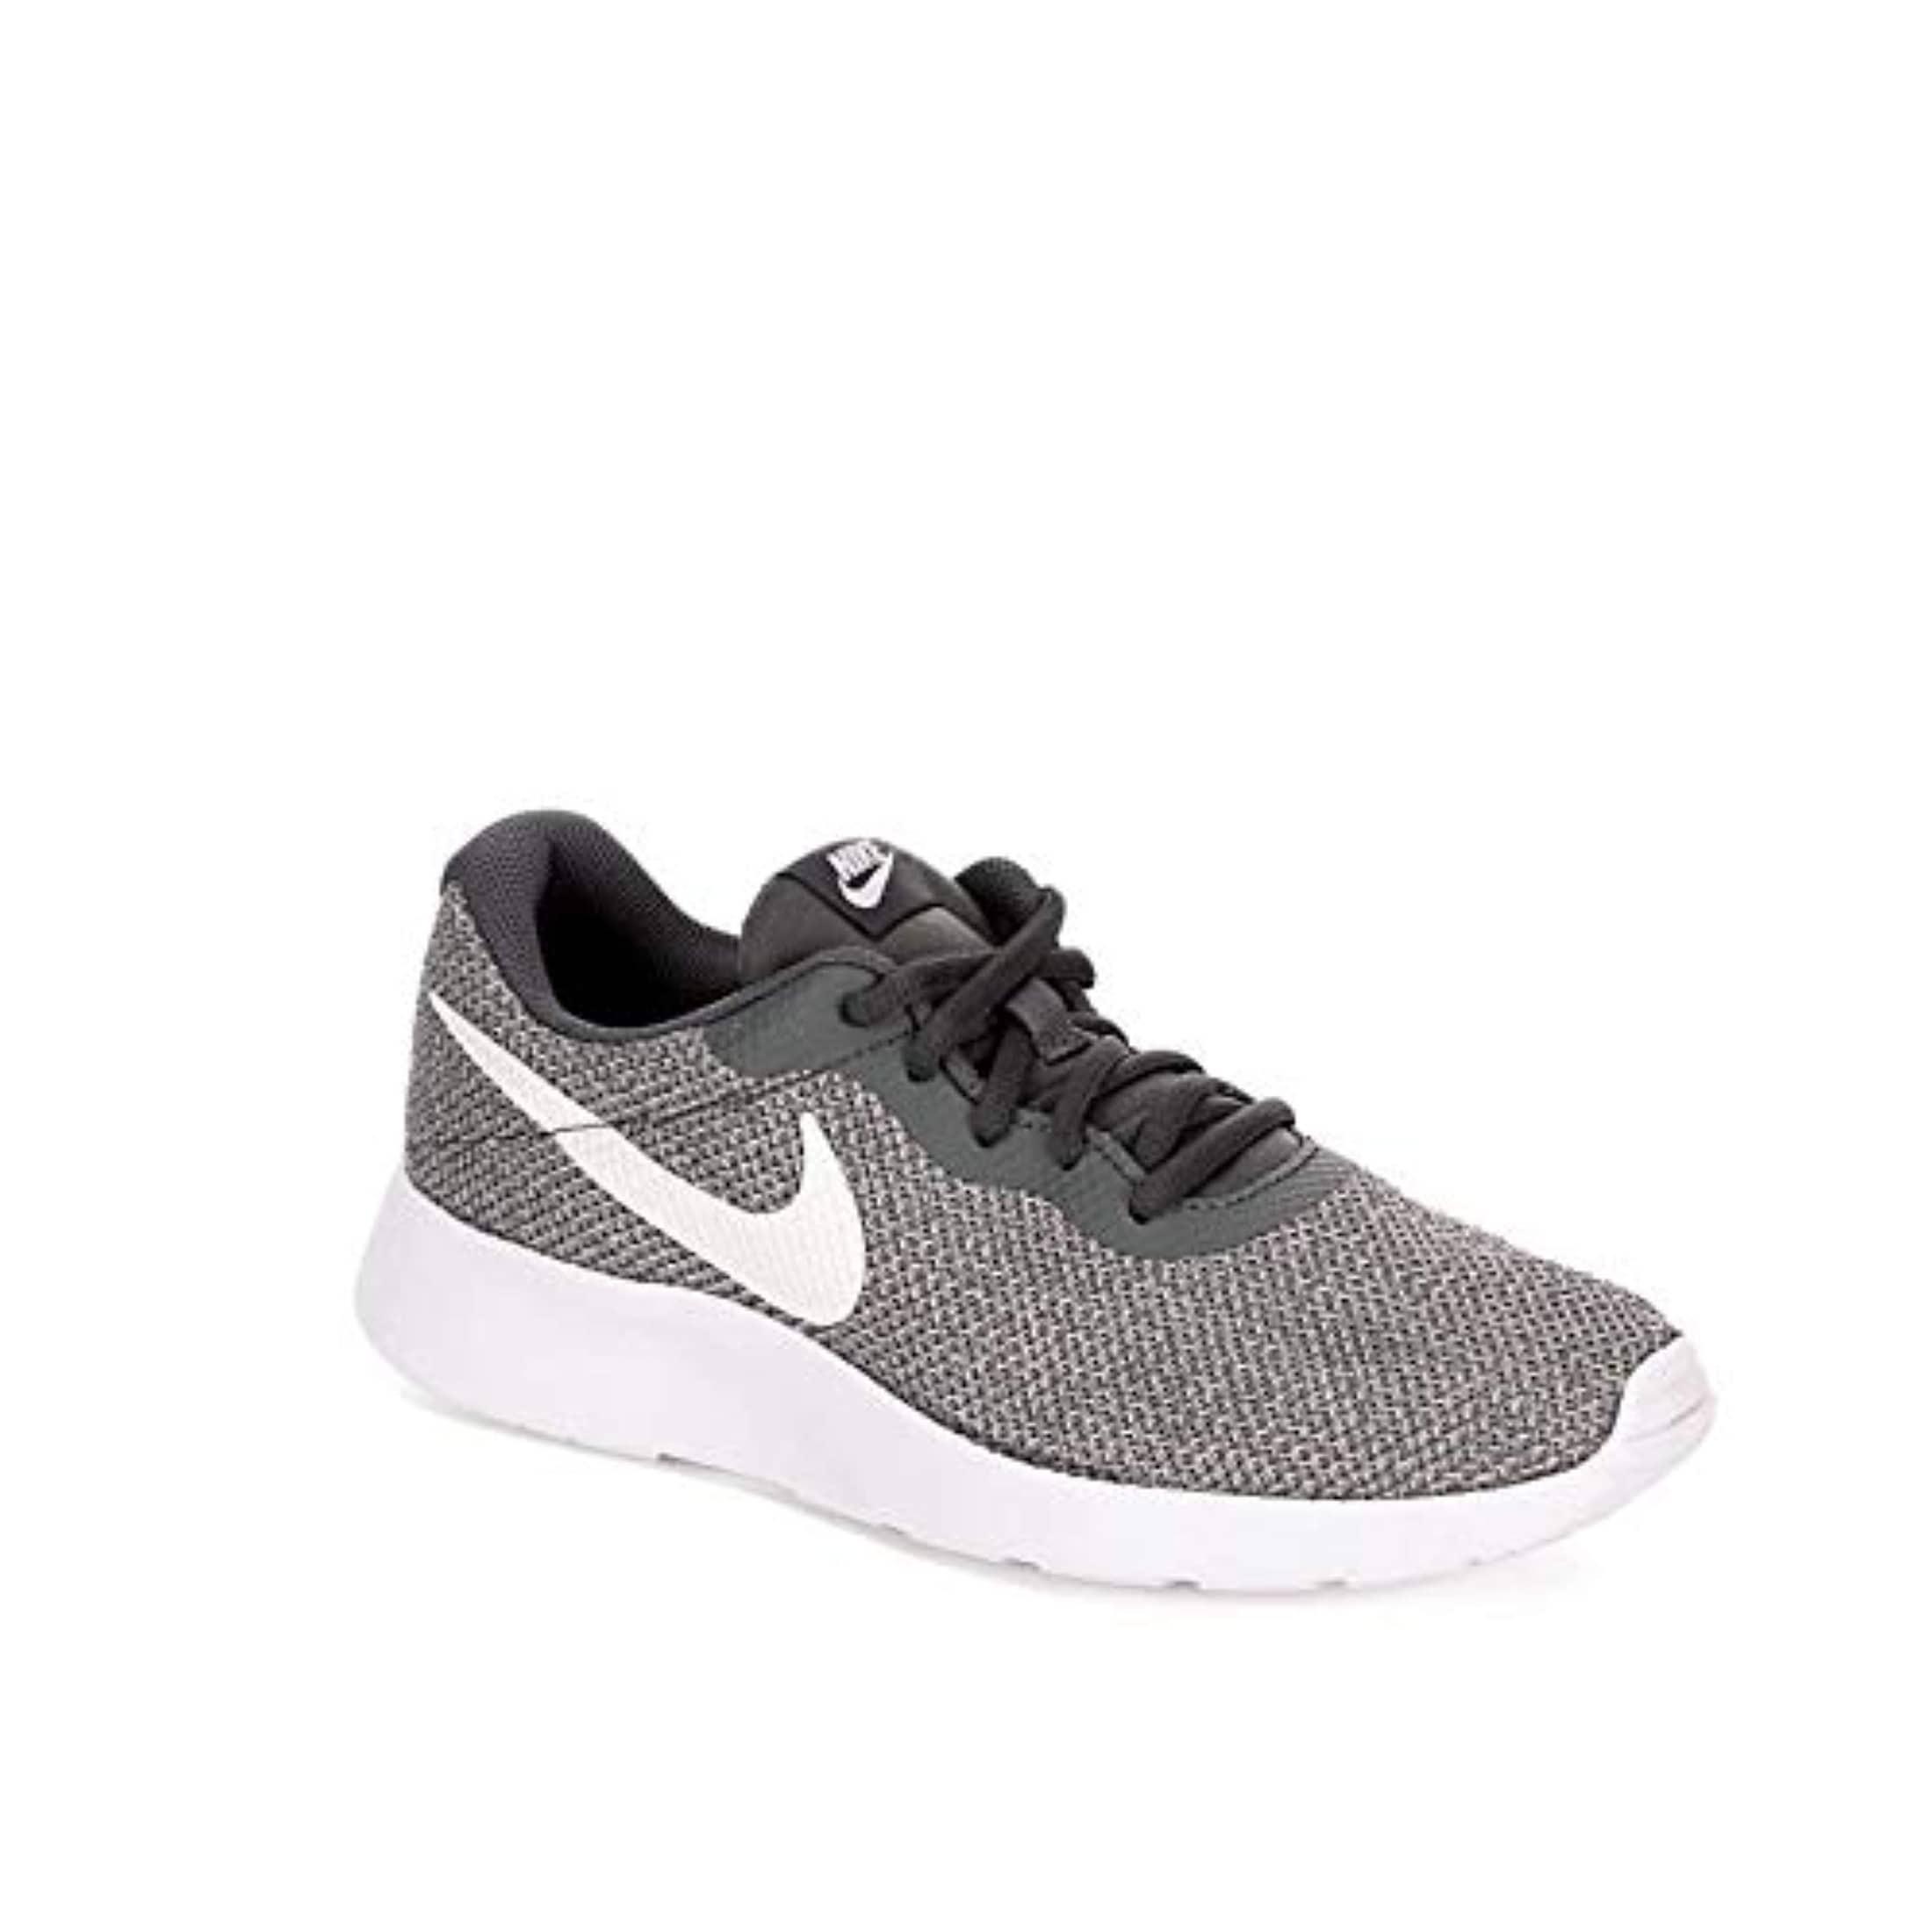 Tanjun Trainers Shoes, Dark Grey/White